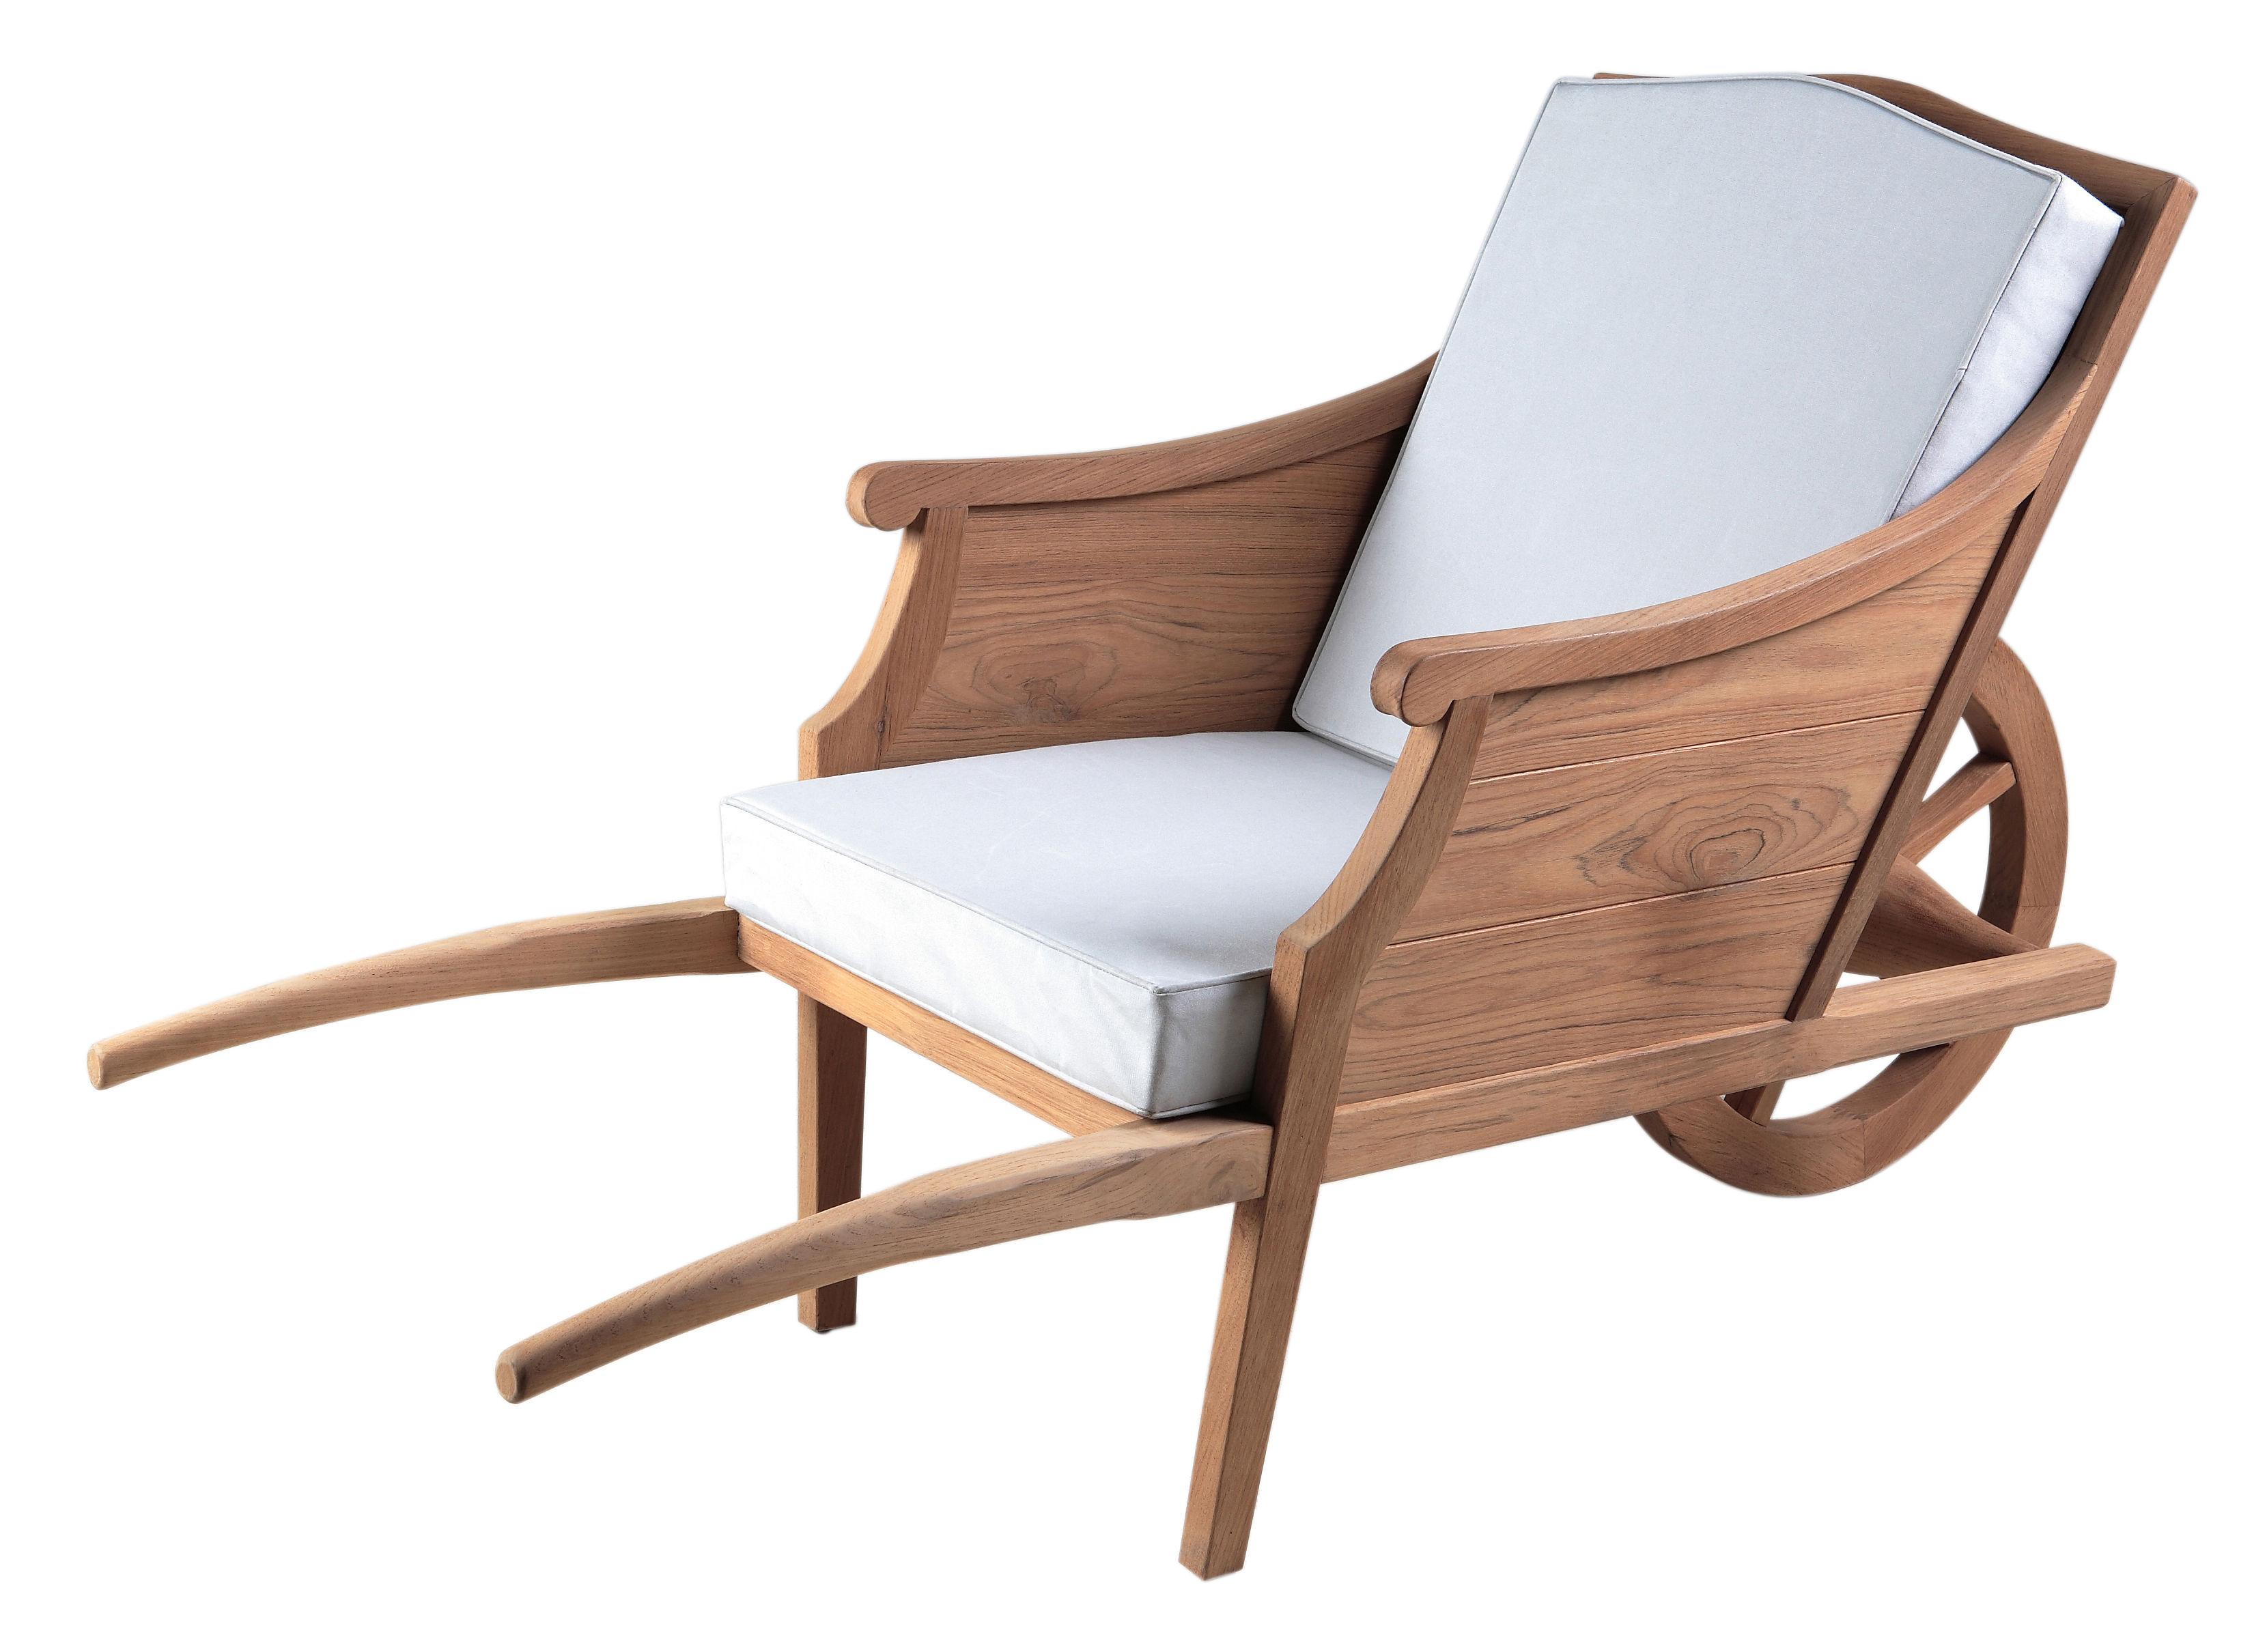 ceci n 39 est pas une brouette armchair outdoor teak white by xo. Black Bedroom Furniture Sets. Home Design Ideas